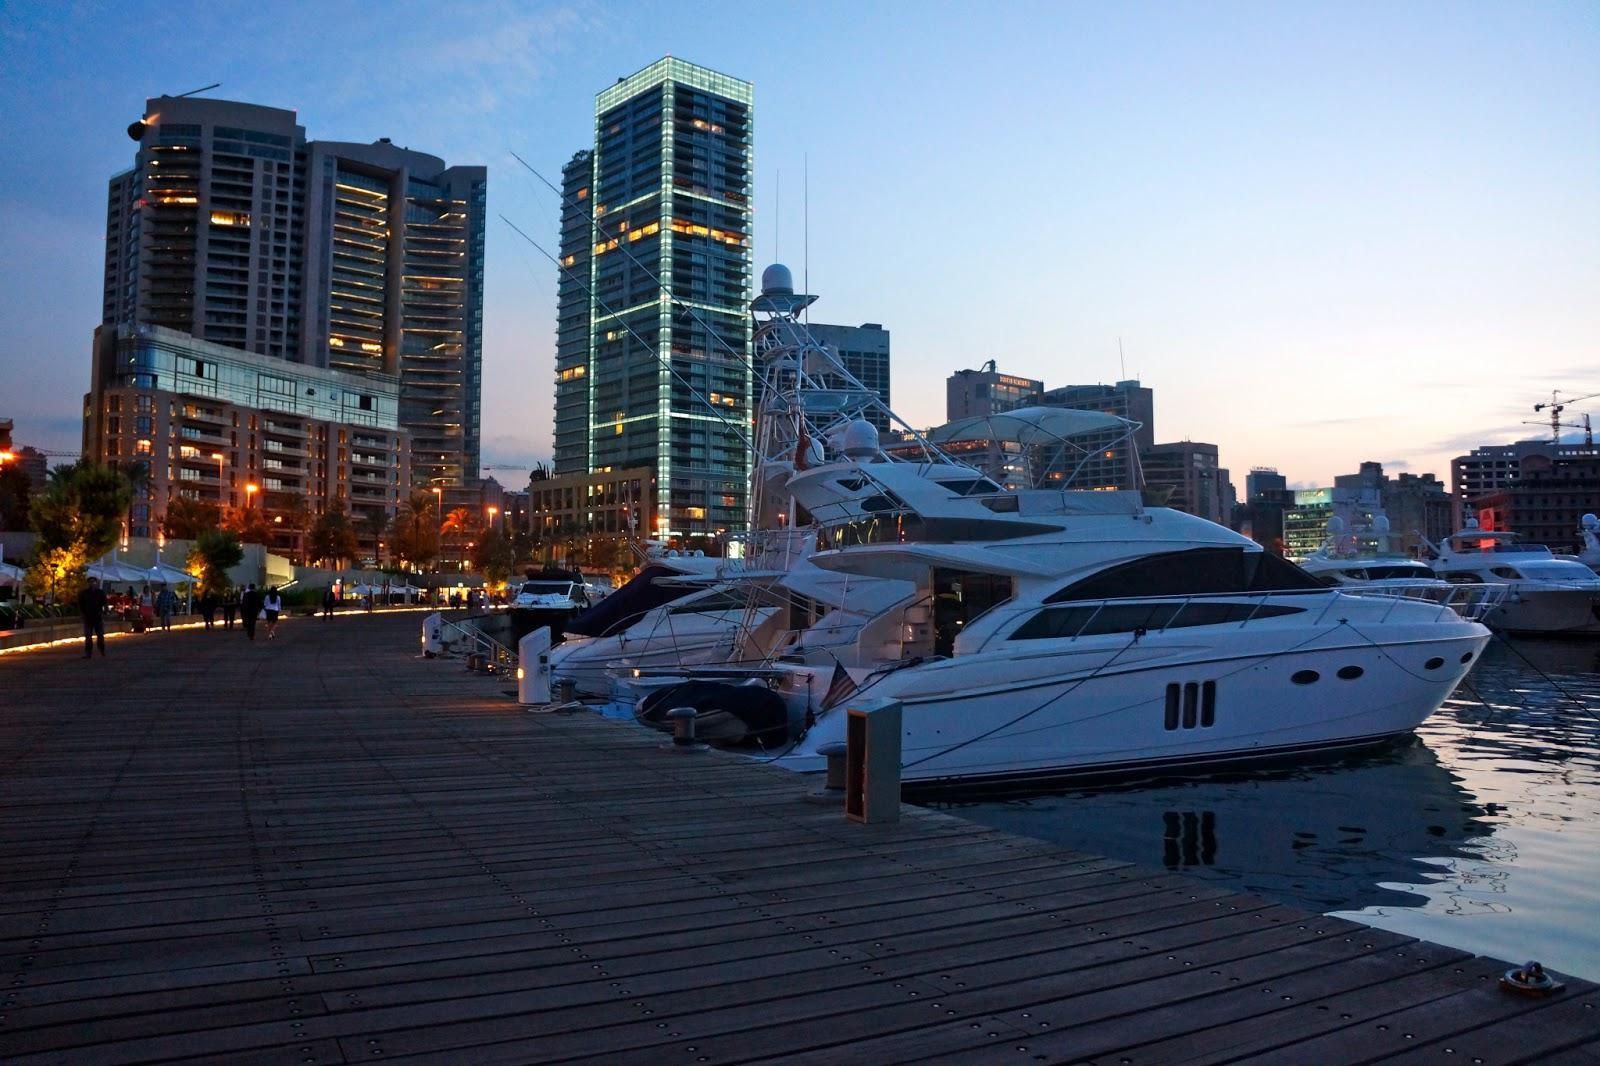 Picture of Zaitunay Bay in Beirut, Lebanon.